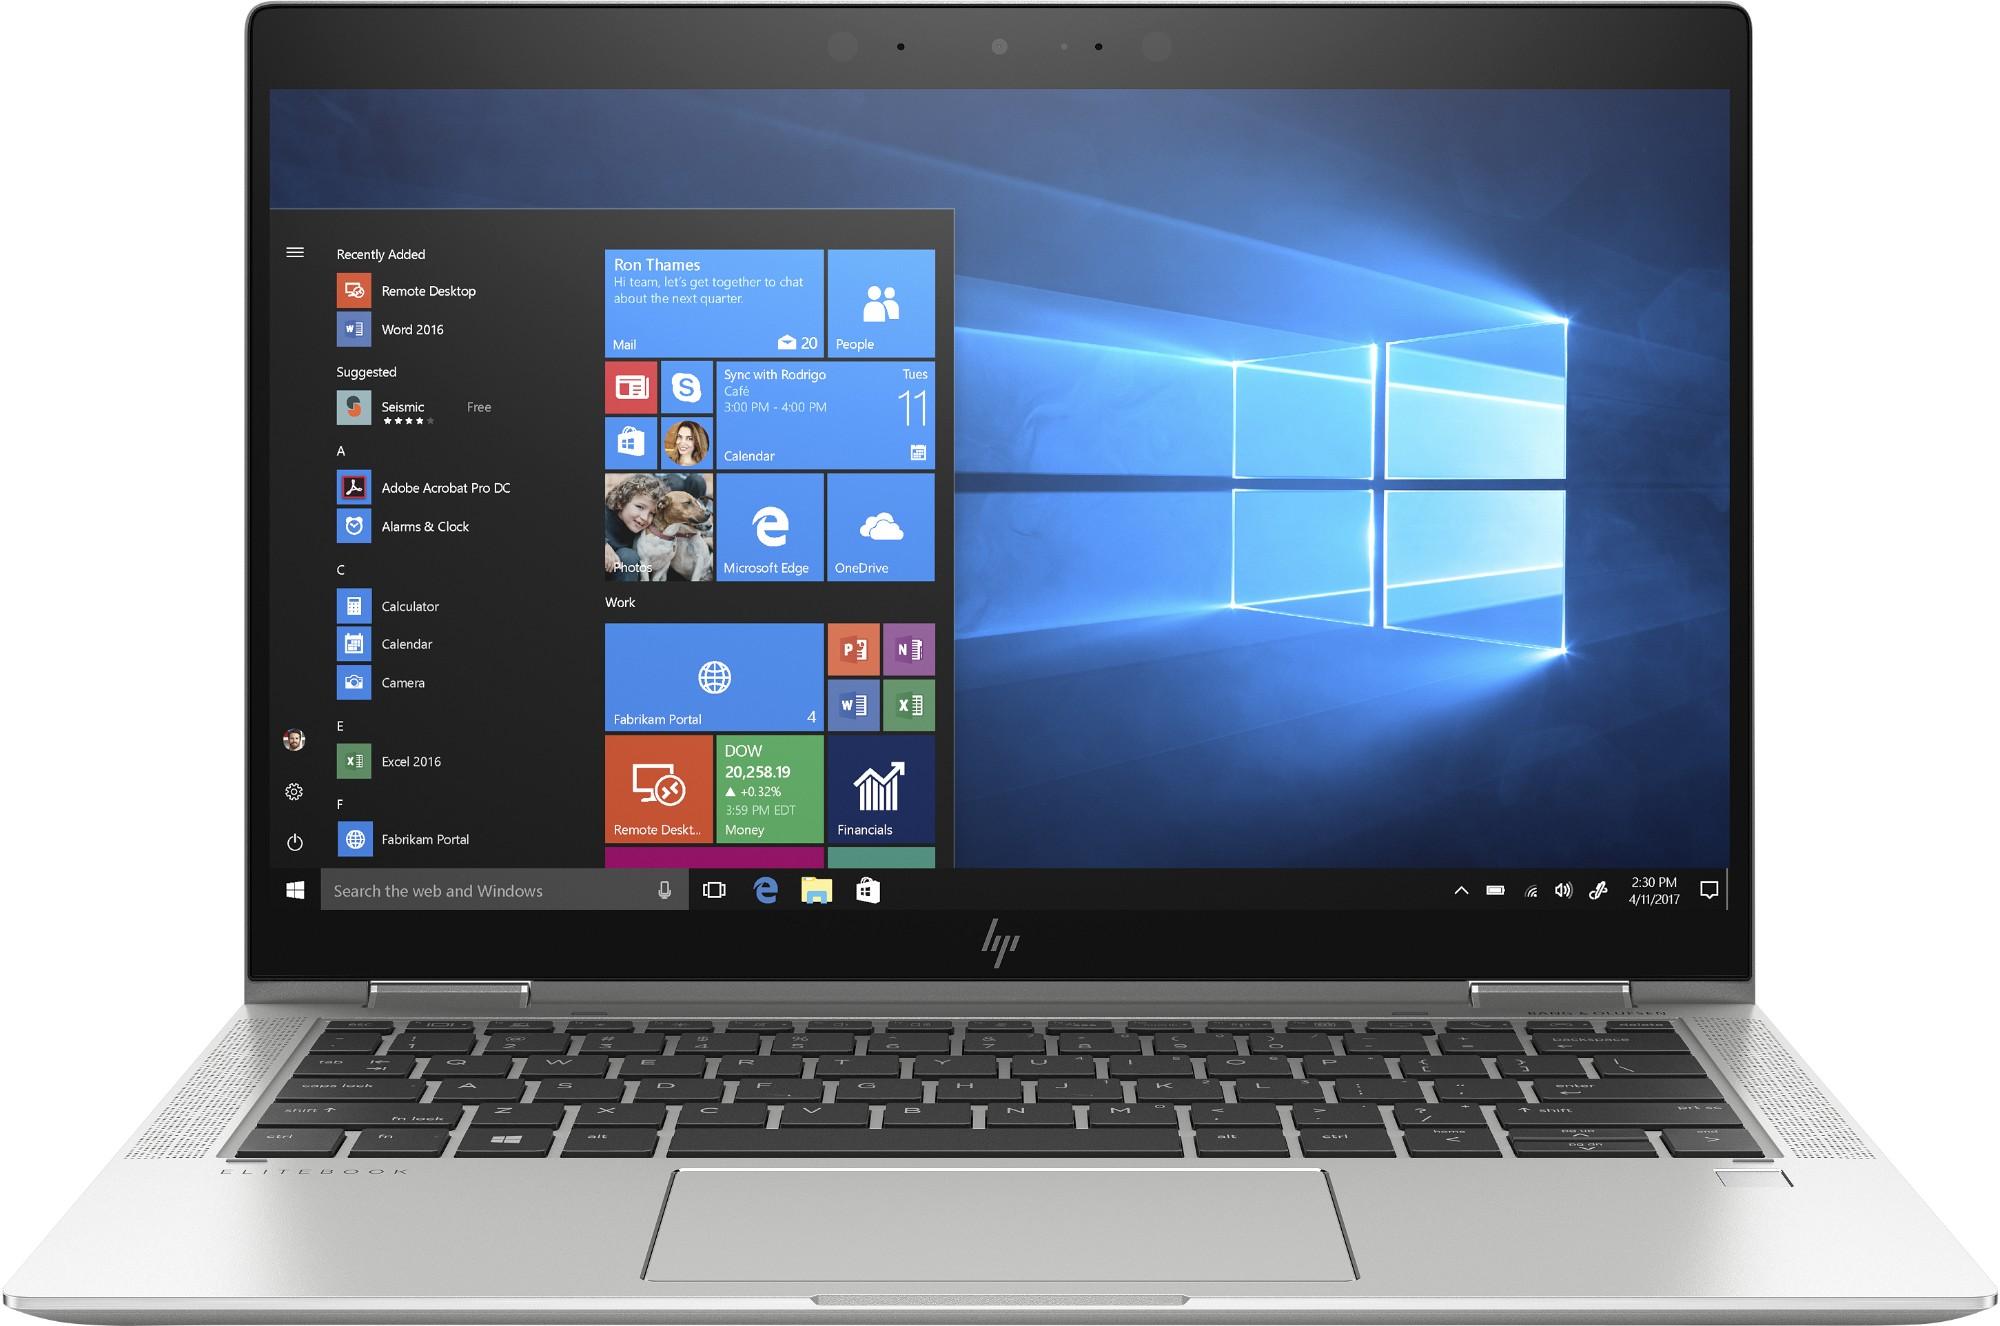 "HP EliteBook x360 1030 G4 Híbrido (2-en-1) Plata 33,8 cm (13.3"") 1920 x 1080 Pixeles Pantalla táctil 8ª generación de procesadores Intel® Core™ i7 16 GB LPDDR3-SDRAM 1000 GB SSD Wi-Fi 6 (802.11ax) Windows 10 Pro"